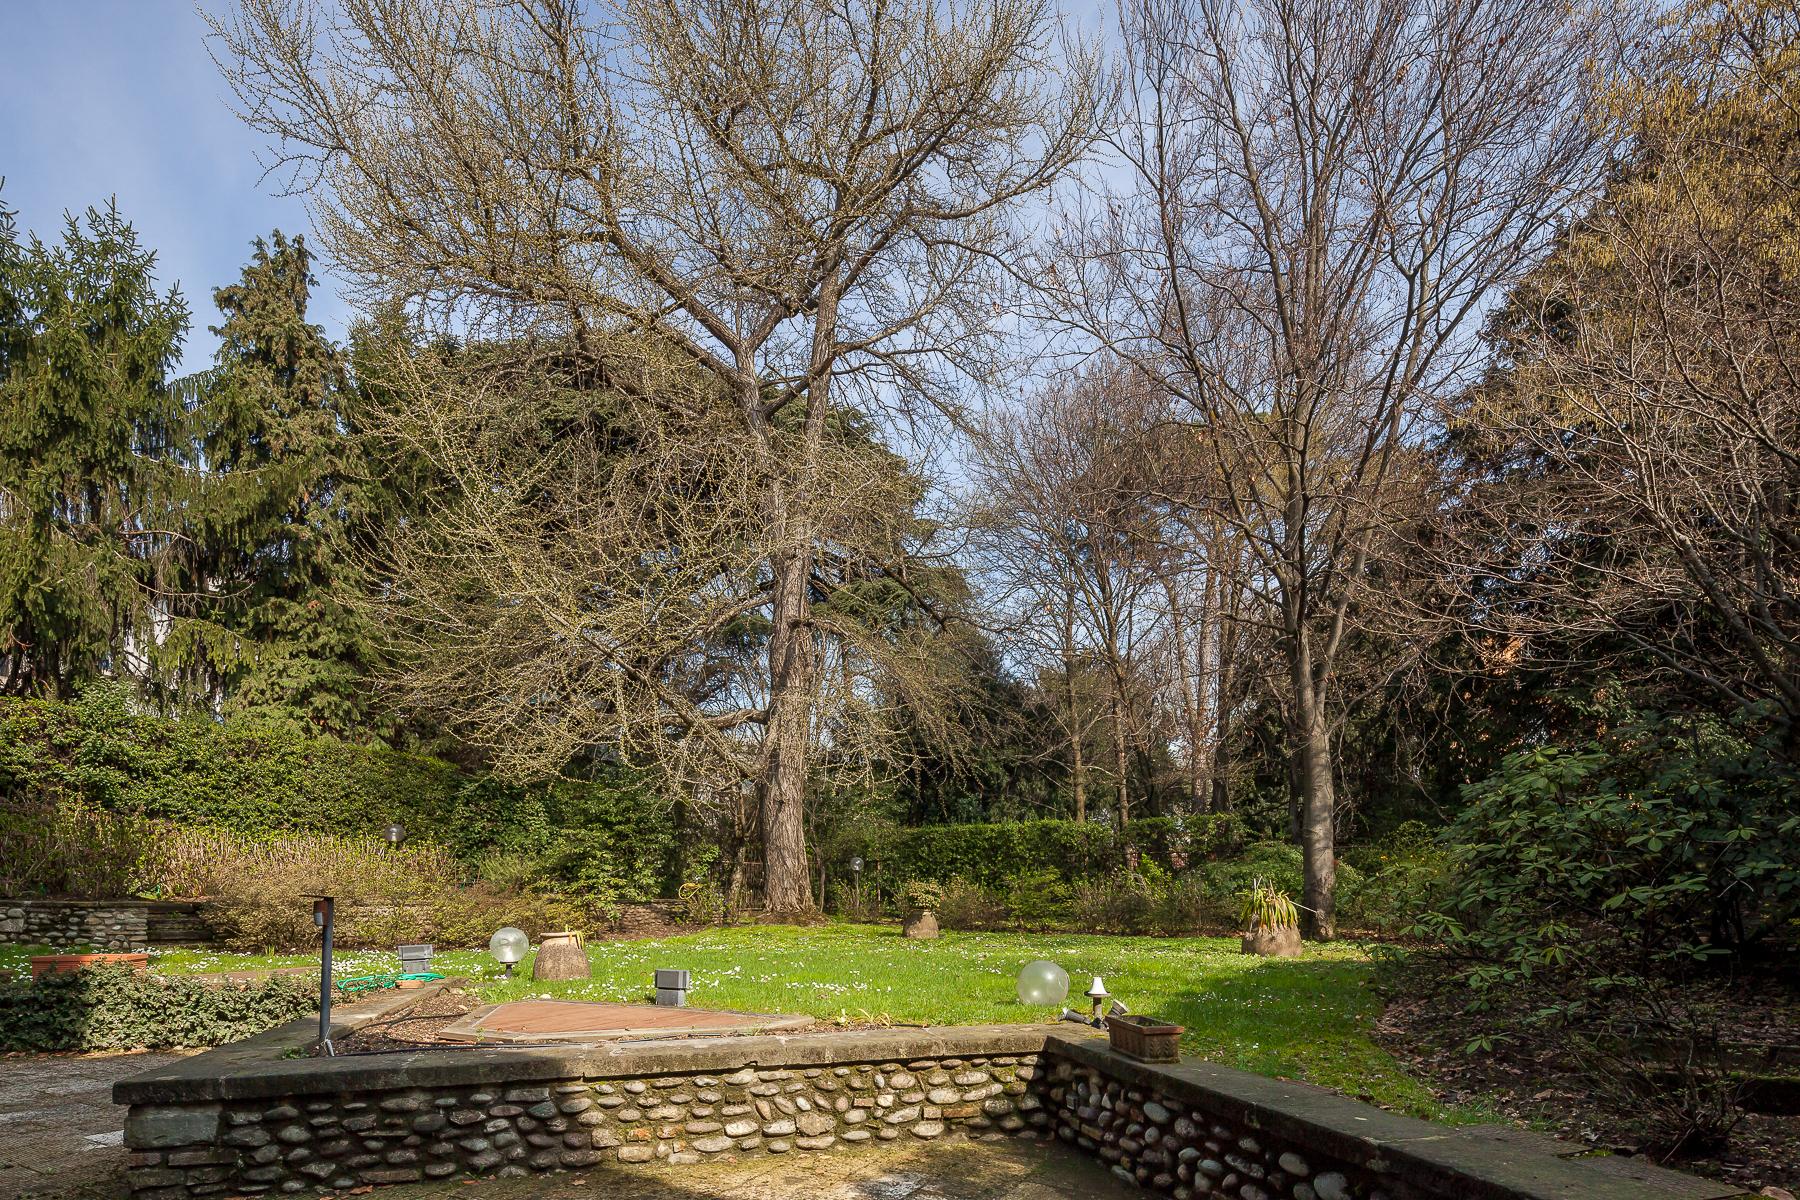 Villa in Vendita a Gorle: 5 locali, 850 mq - Foto 20